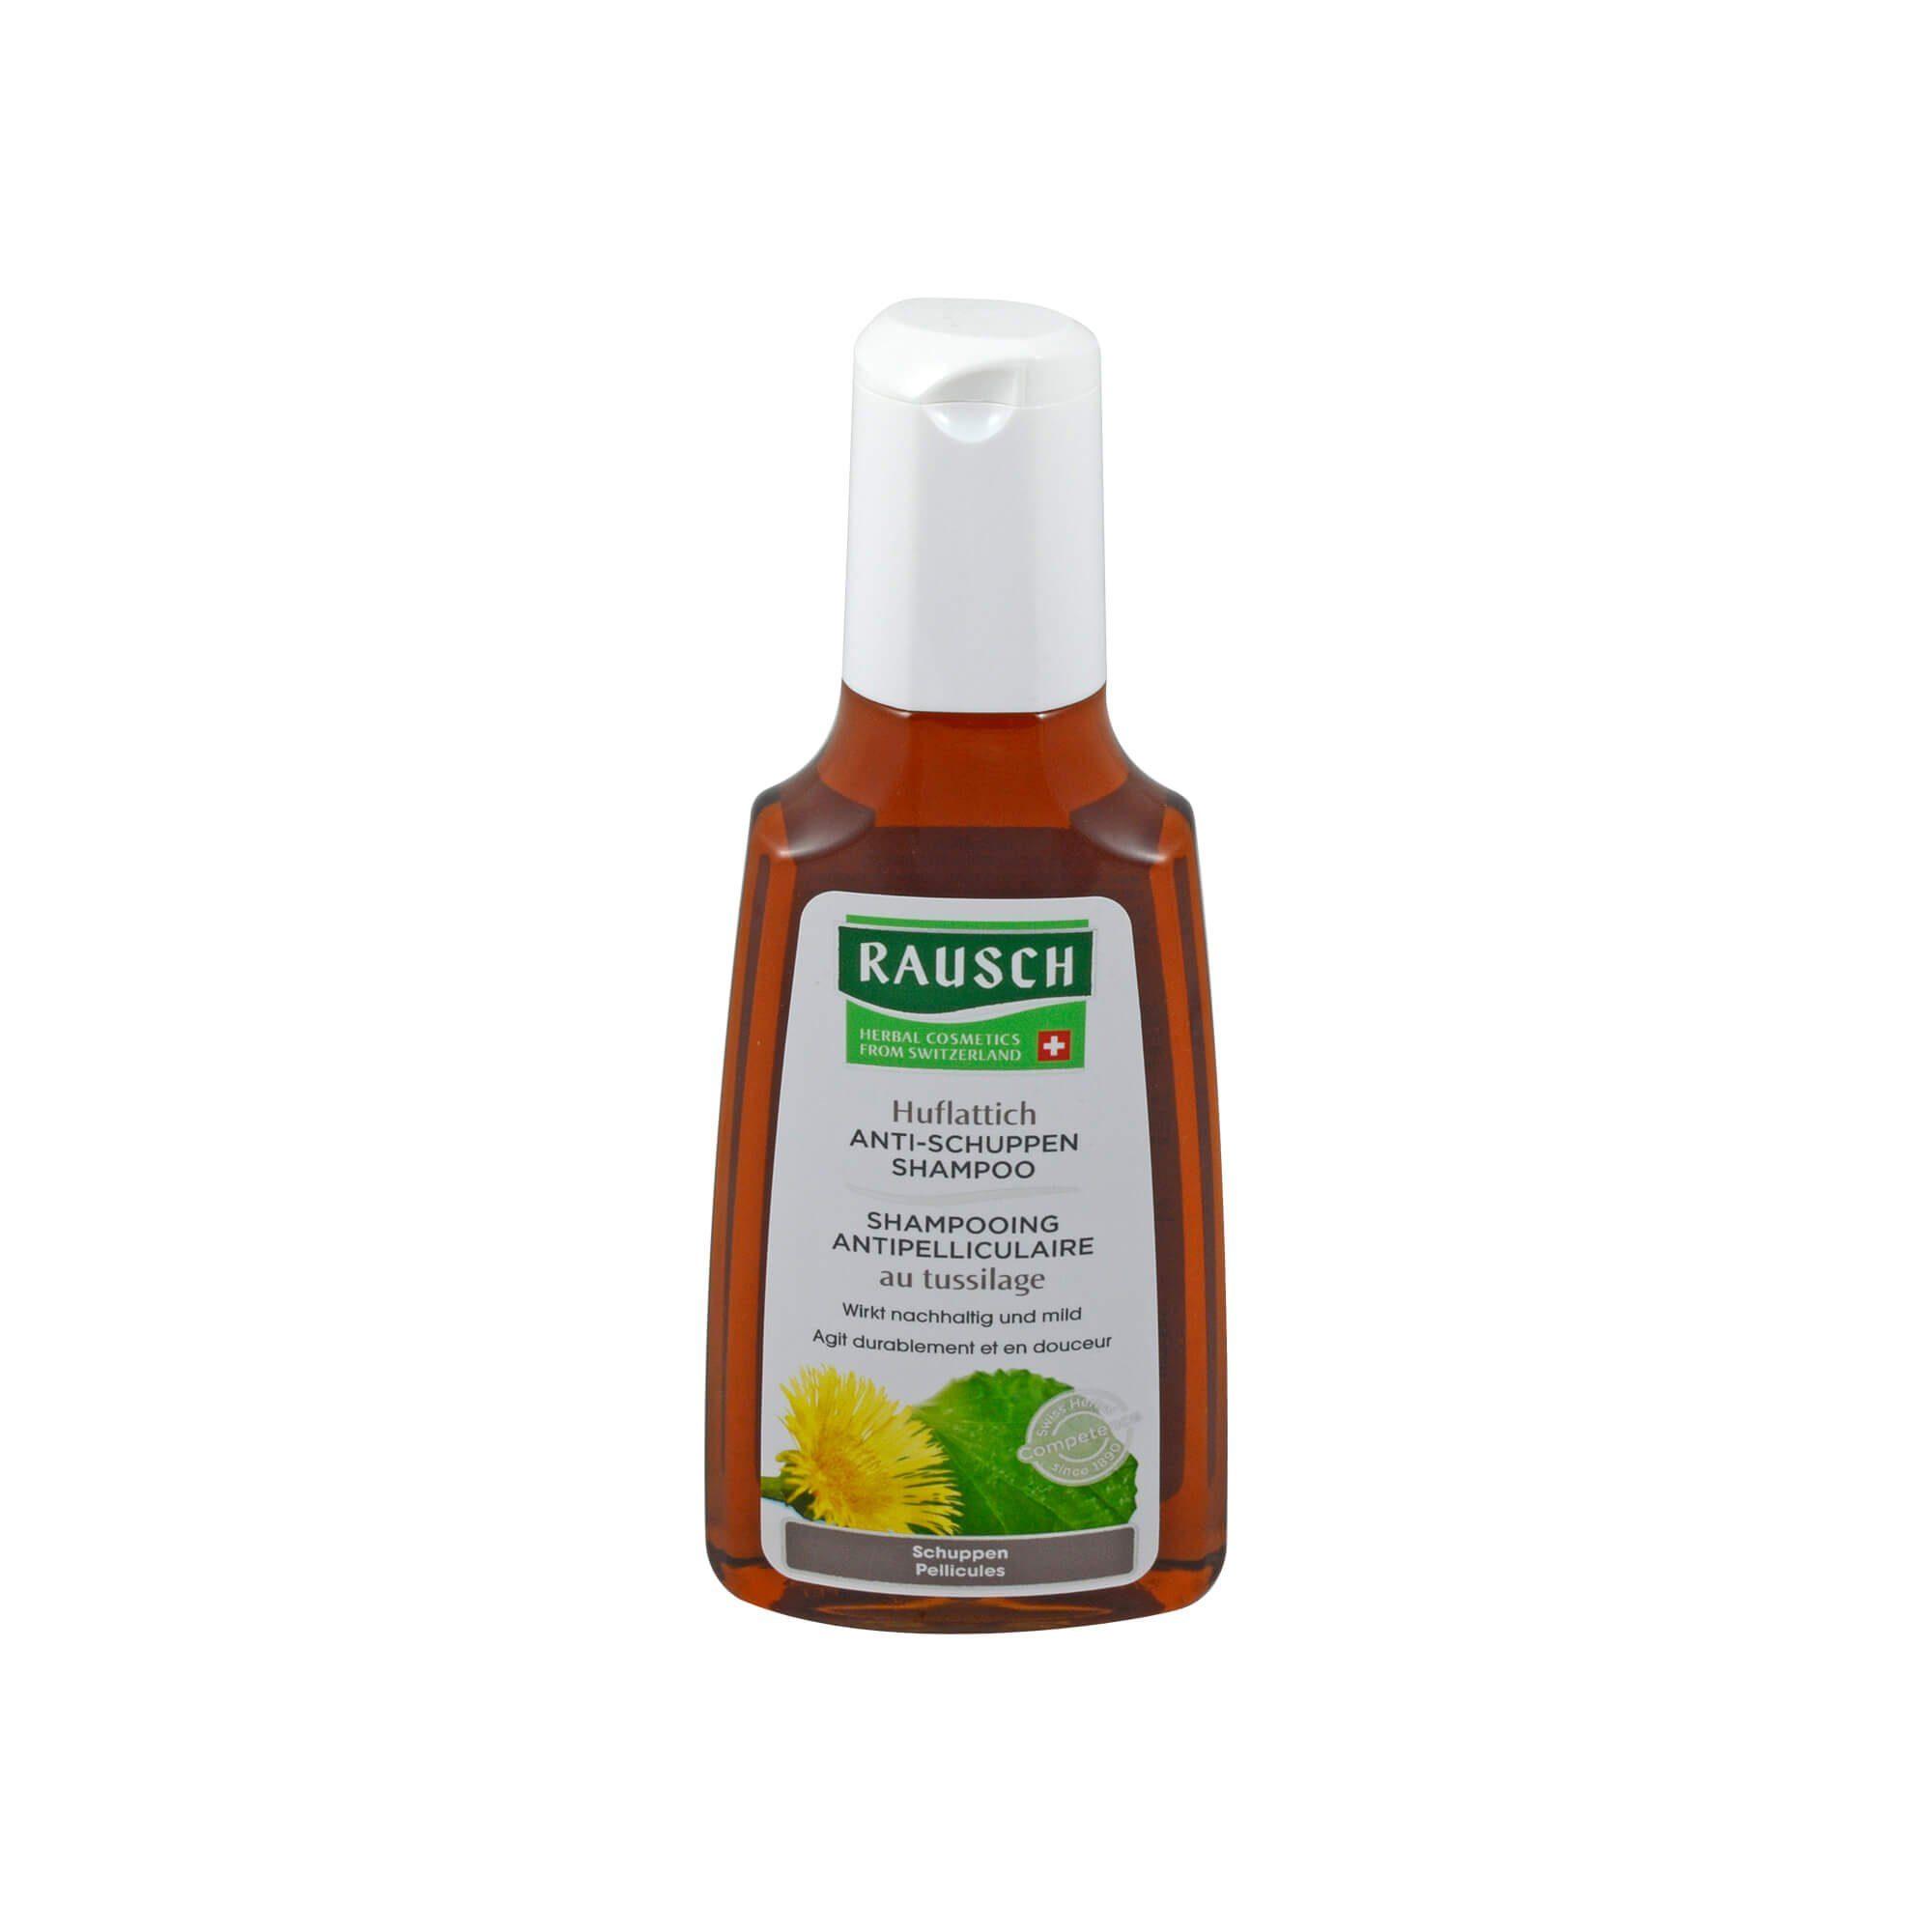 Rausch Huflattich Anti-Schuppen Shampoo , 200 ml